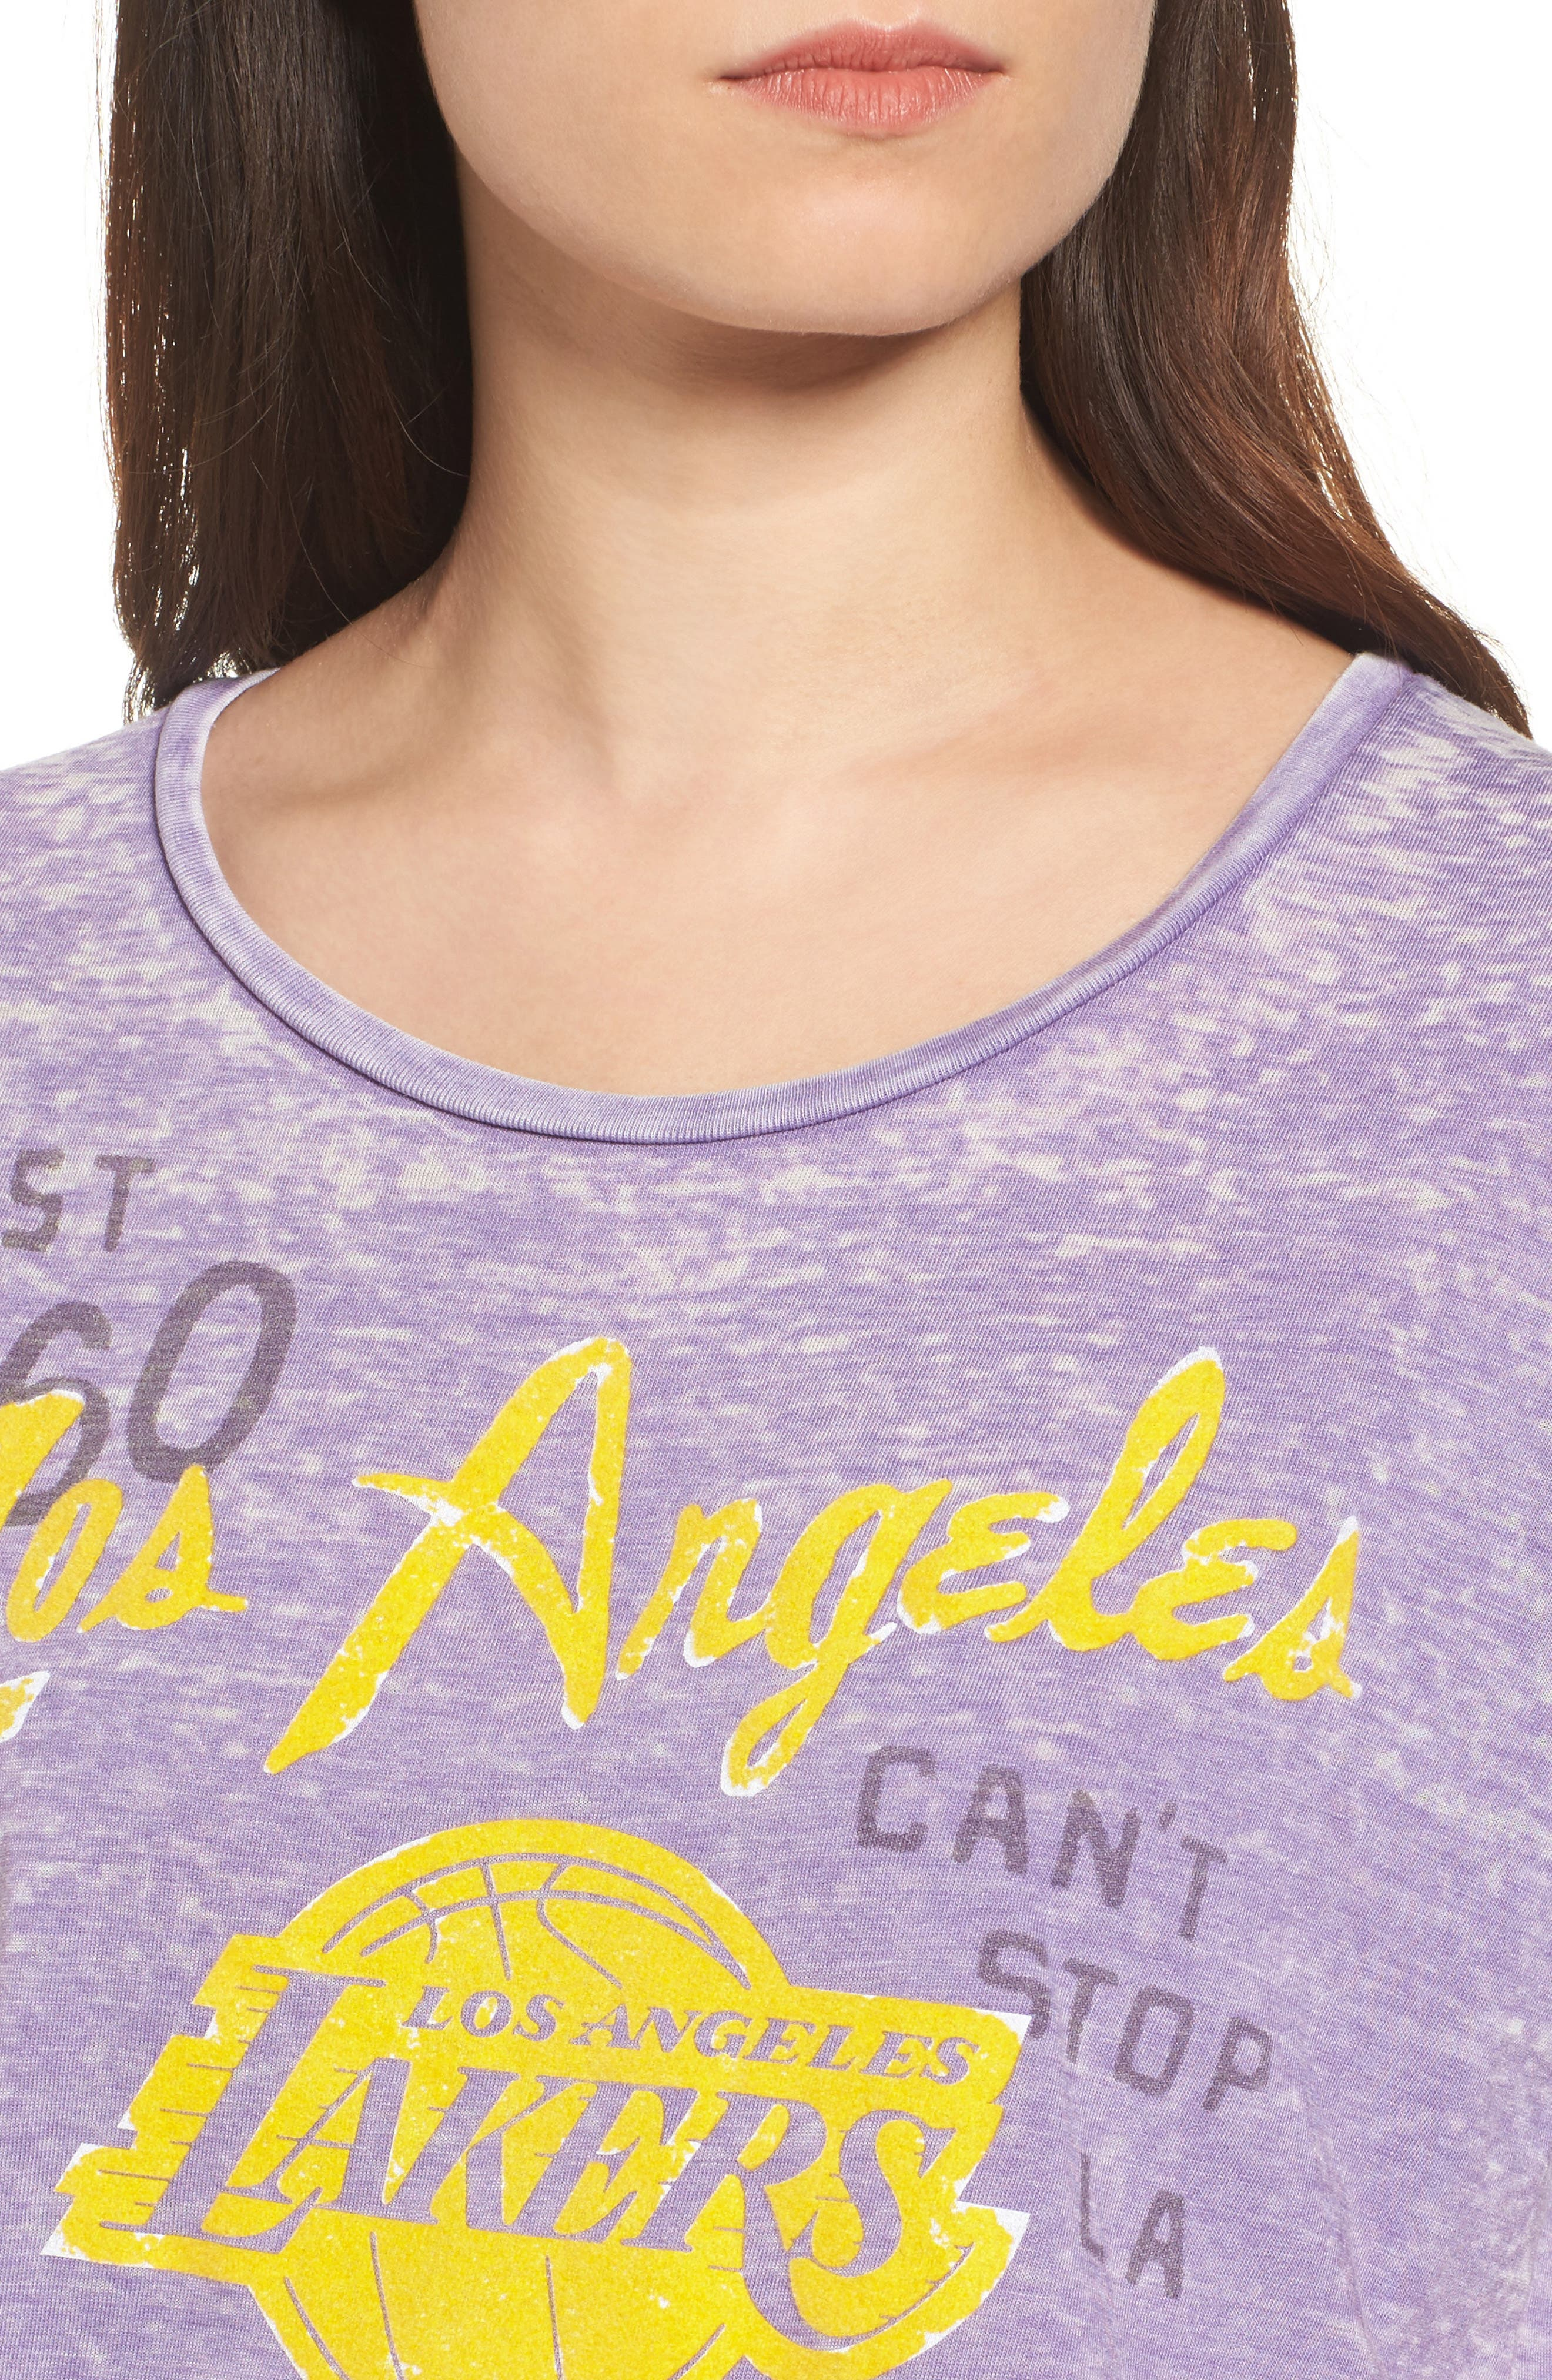 NBA Los Angeles Lakers Tee,                             Alternate thumbnail 4, color,                             543